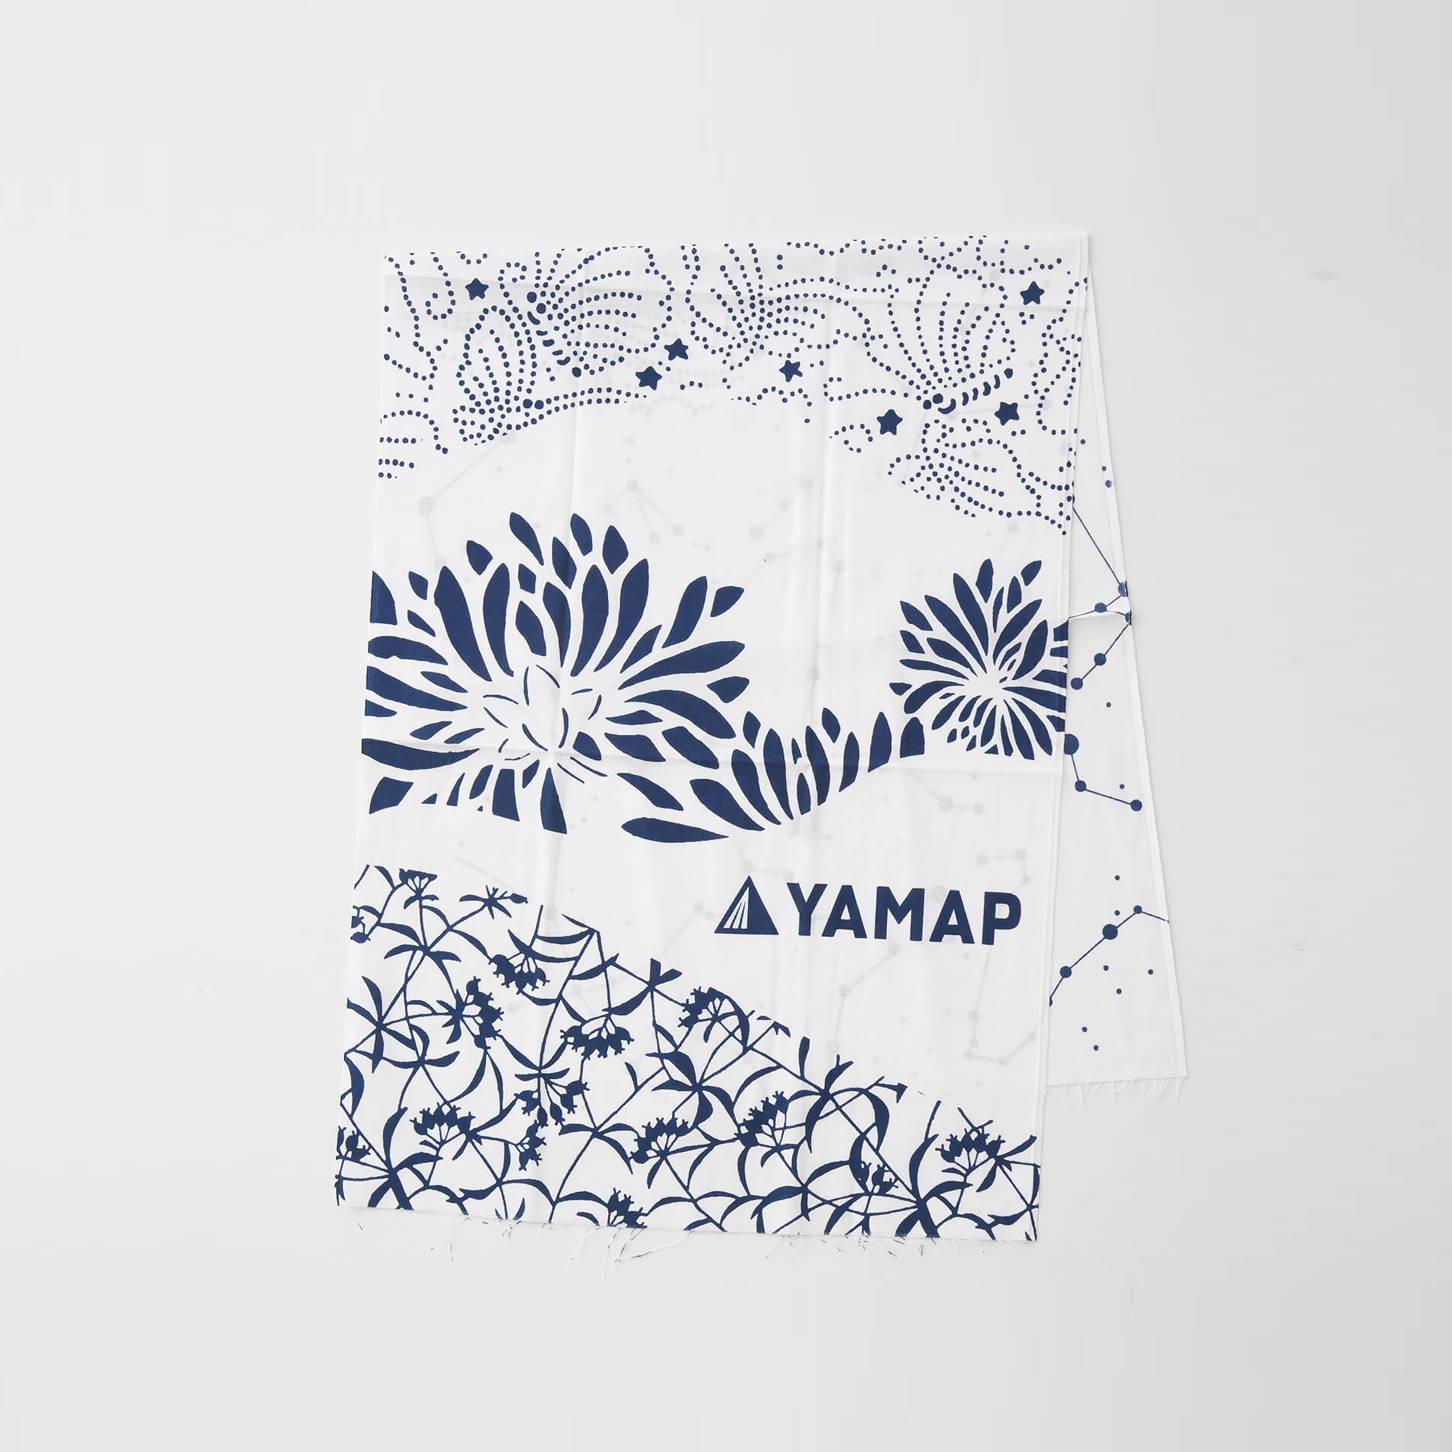 YAMAP(ヤマップ)/オリジナル手ぬぐい/ホワイト